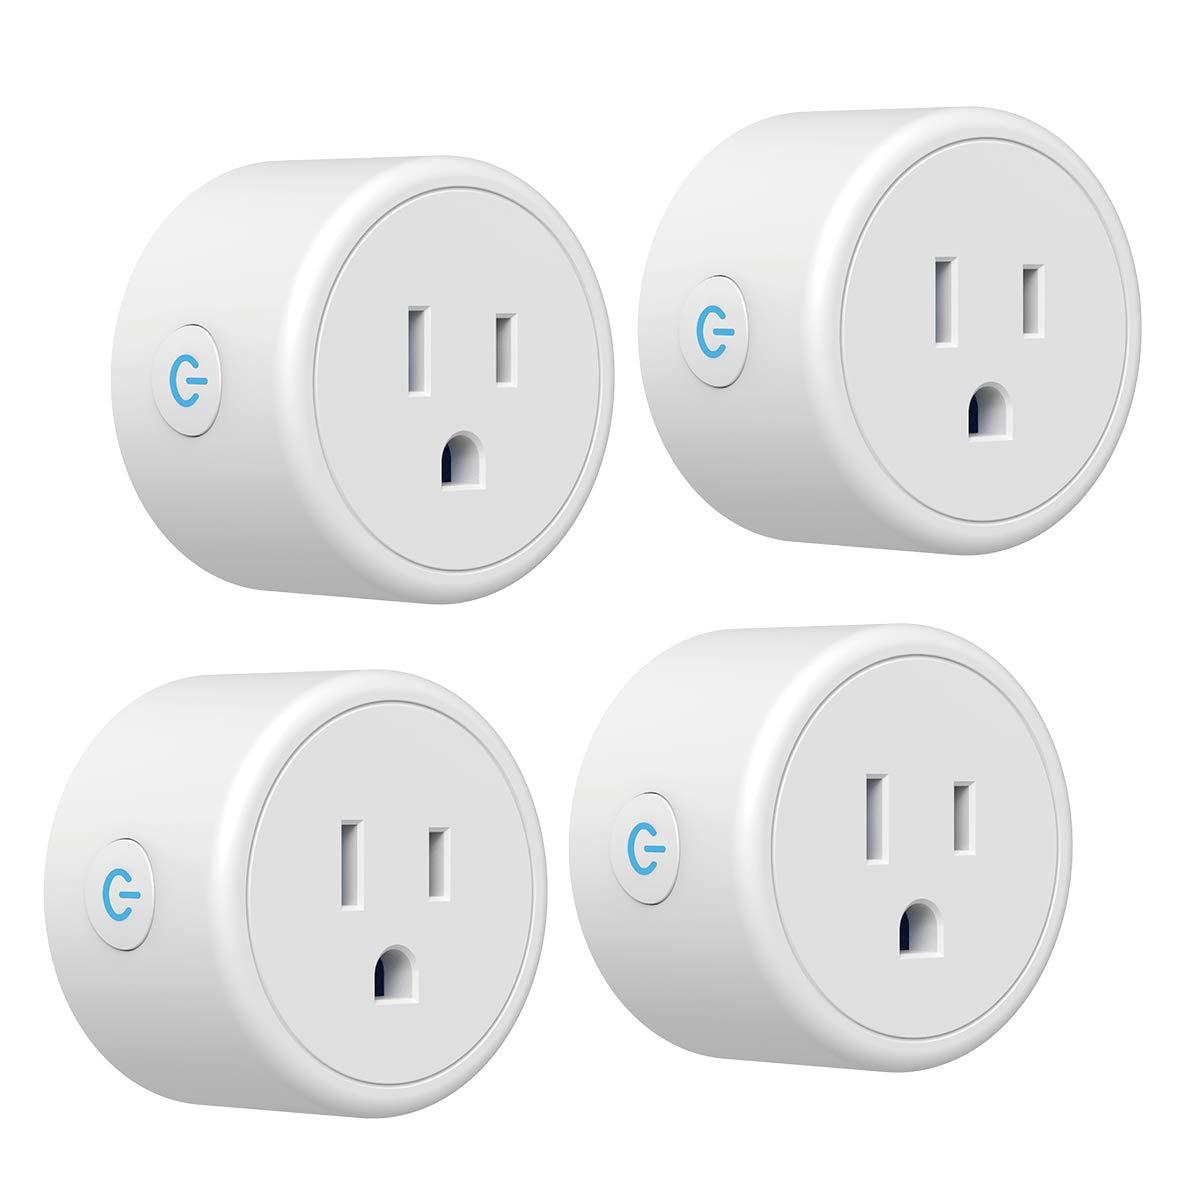 Smart Plug CRESTIN Works Max 54% OFF with Google Cheap sale Mini Alexa Assistant